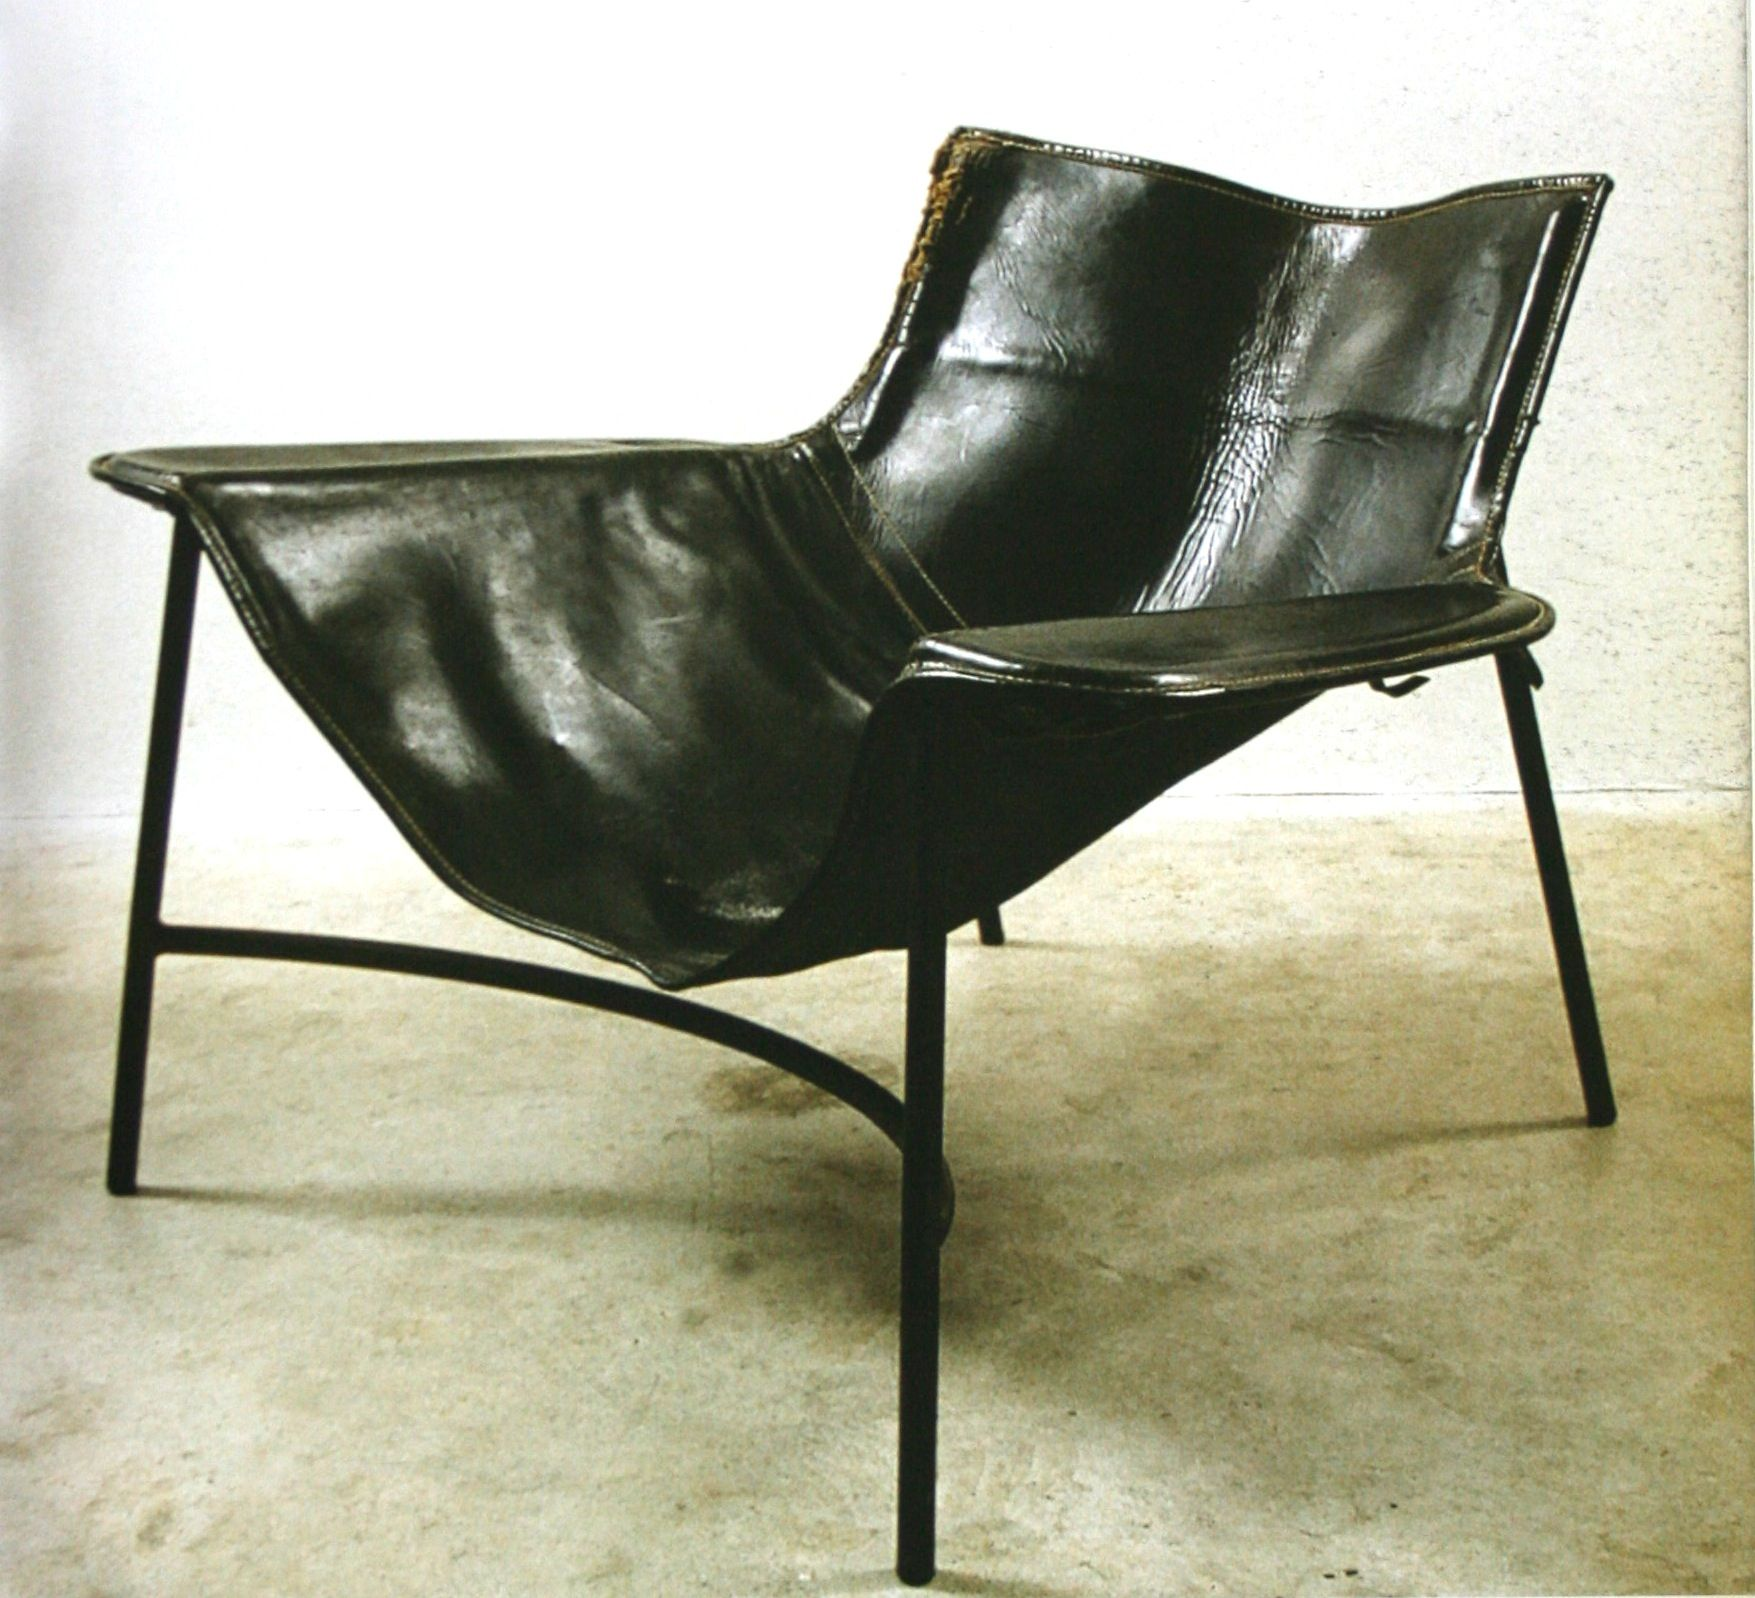 Modern Design Fauteuil.Fauteuil Osaka 1954 Cool Chairs Armchair Furniture